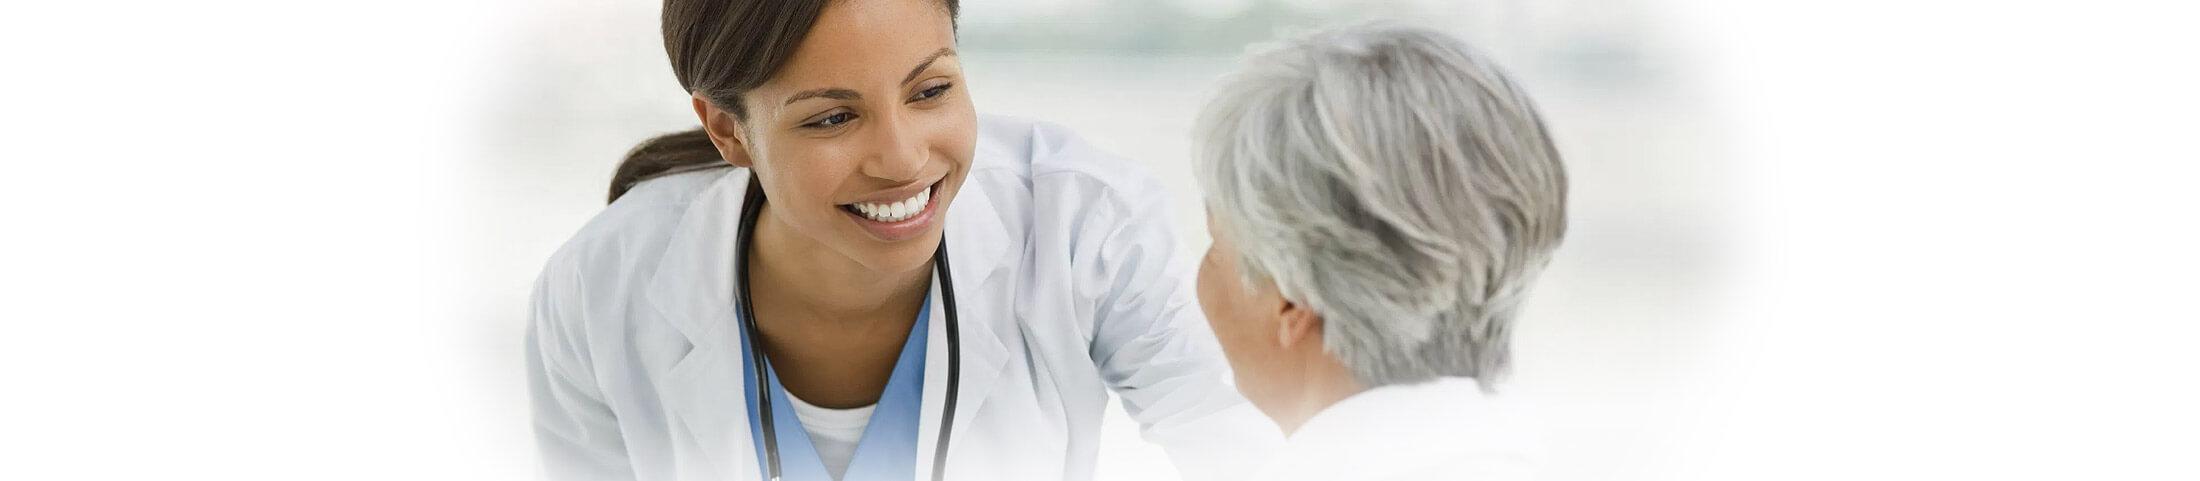 assistencia-de-enfermagem-domiciliar-pronto-care-banner